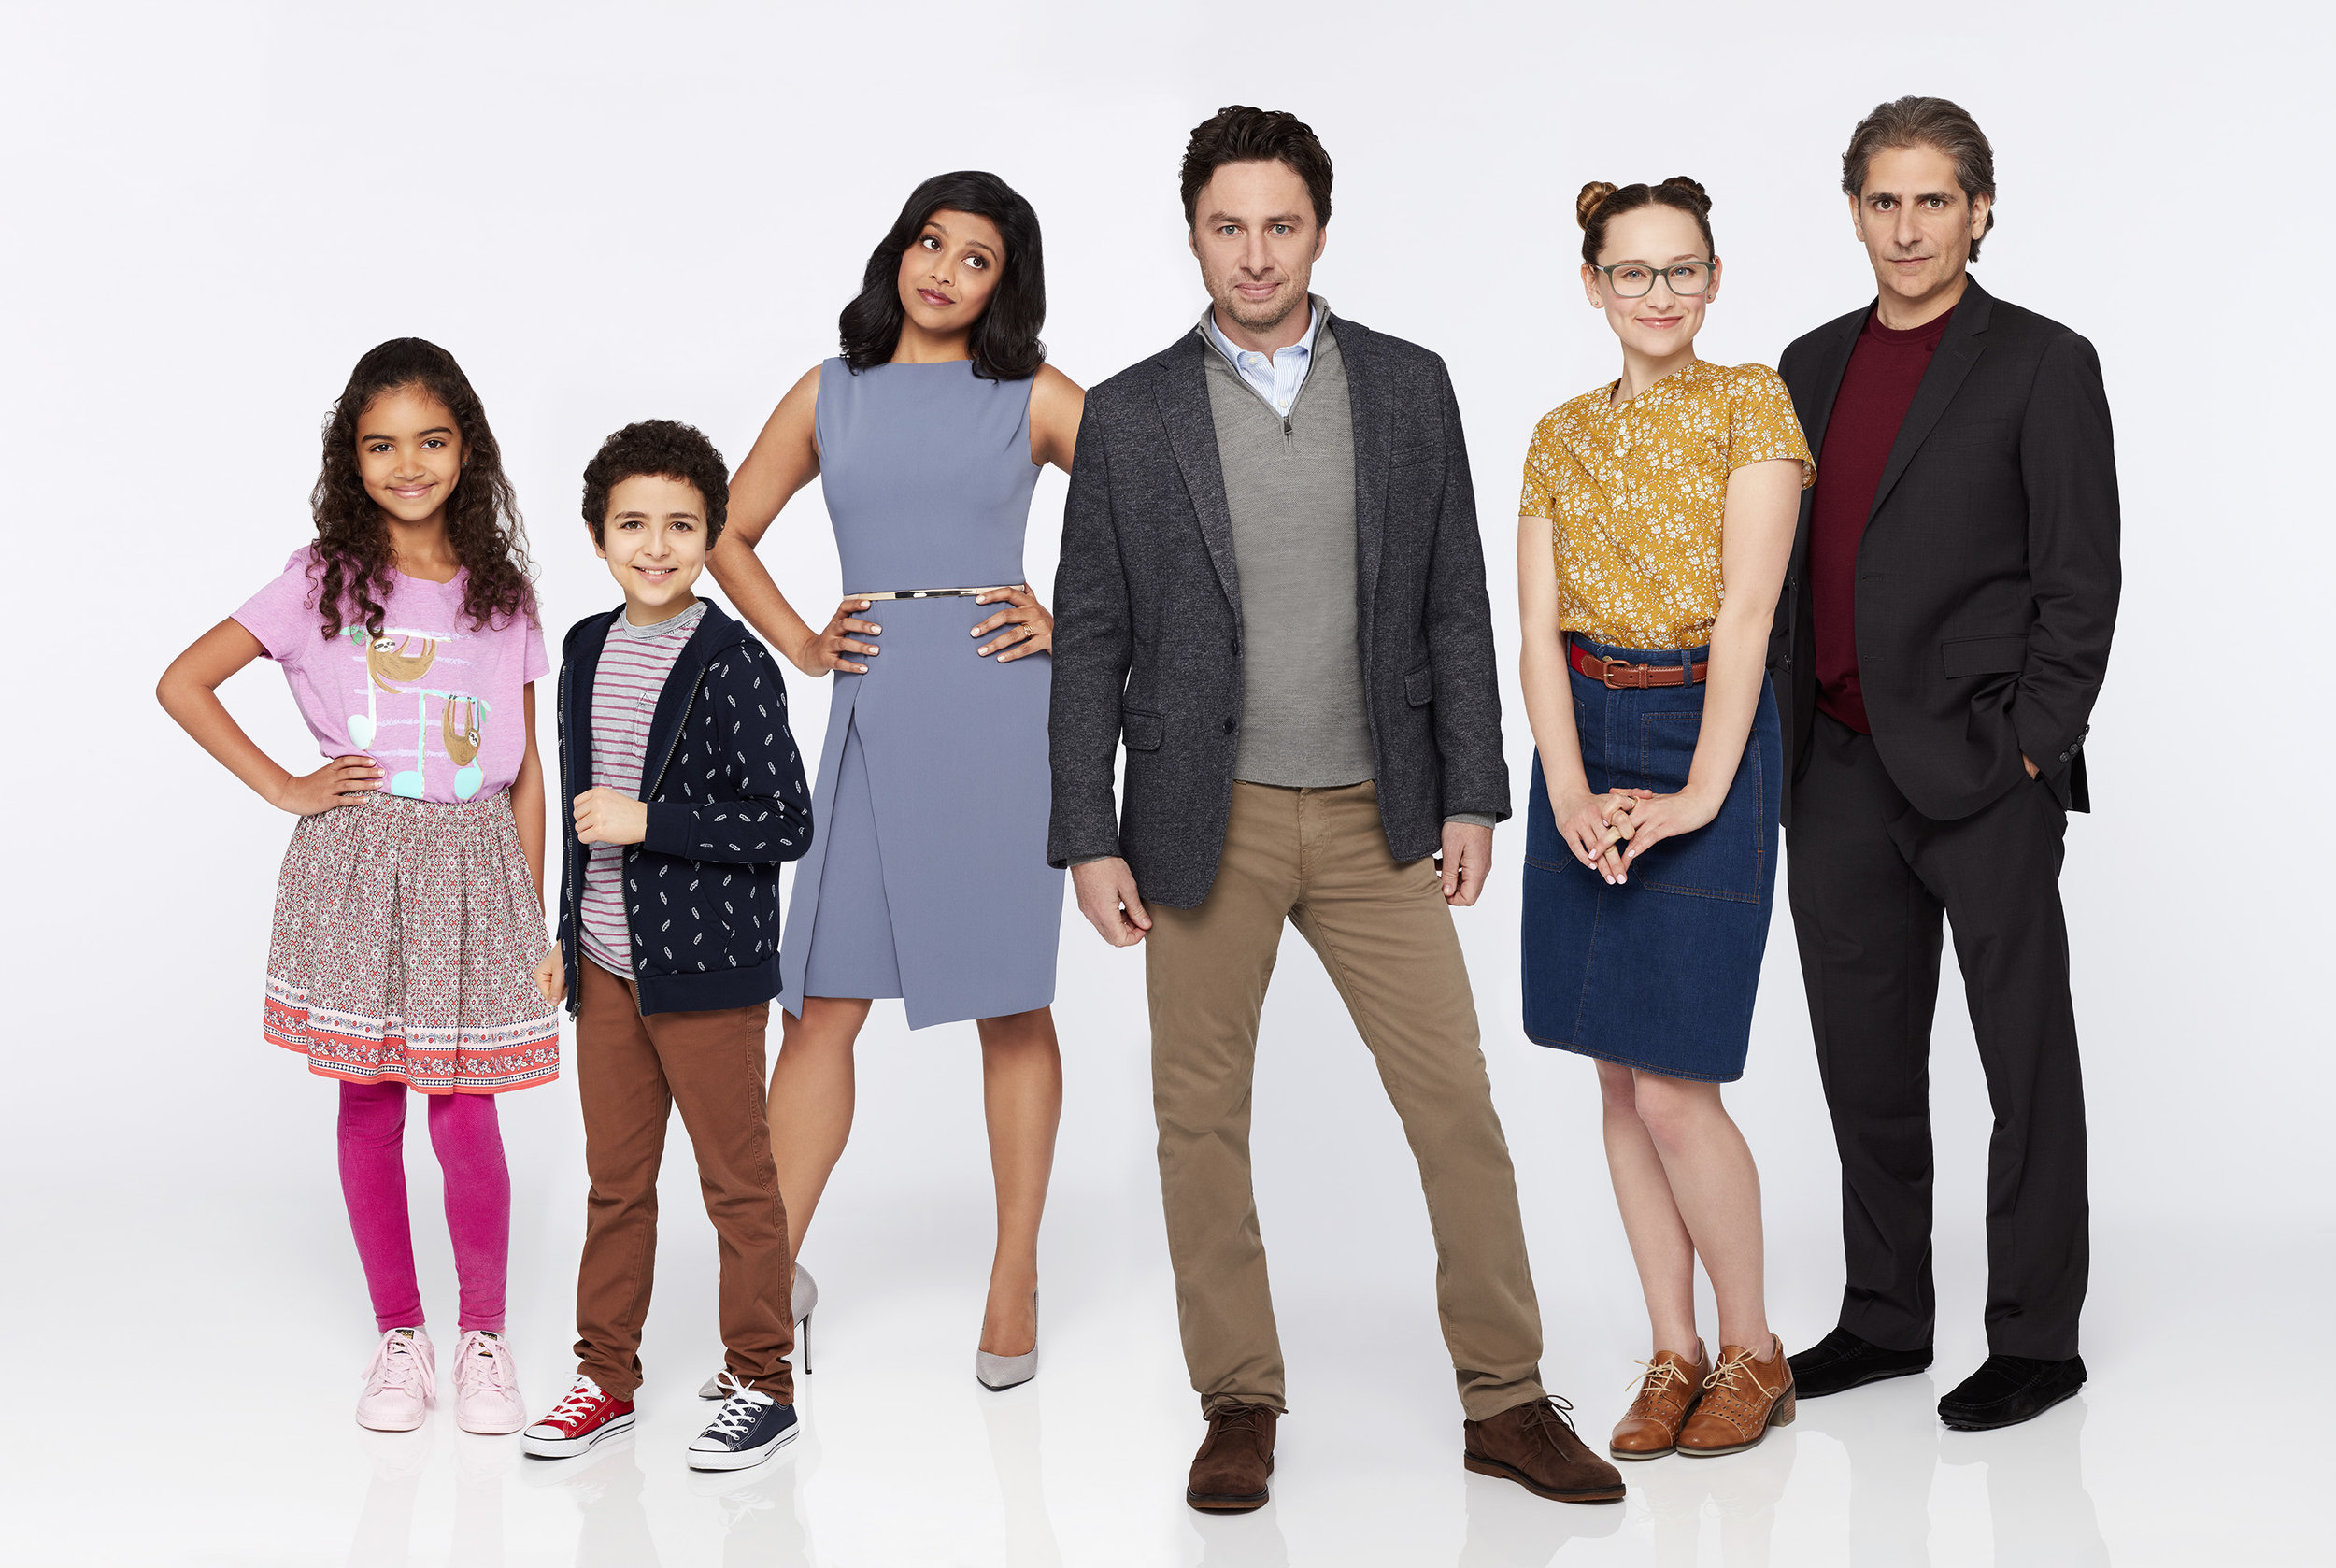 Michael Imperioli ALEX INC whole cast.jpg